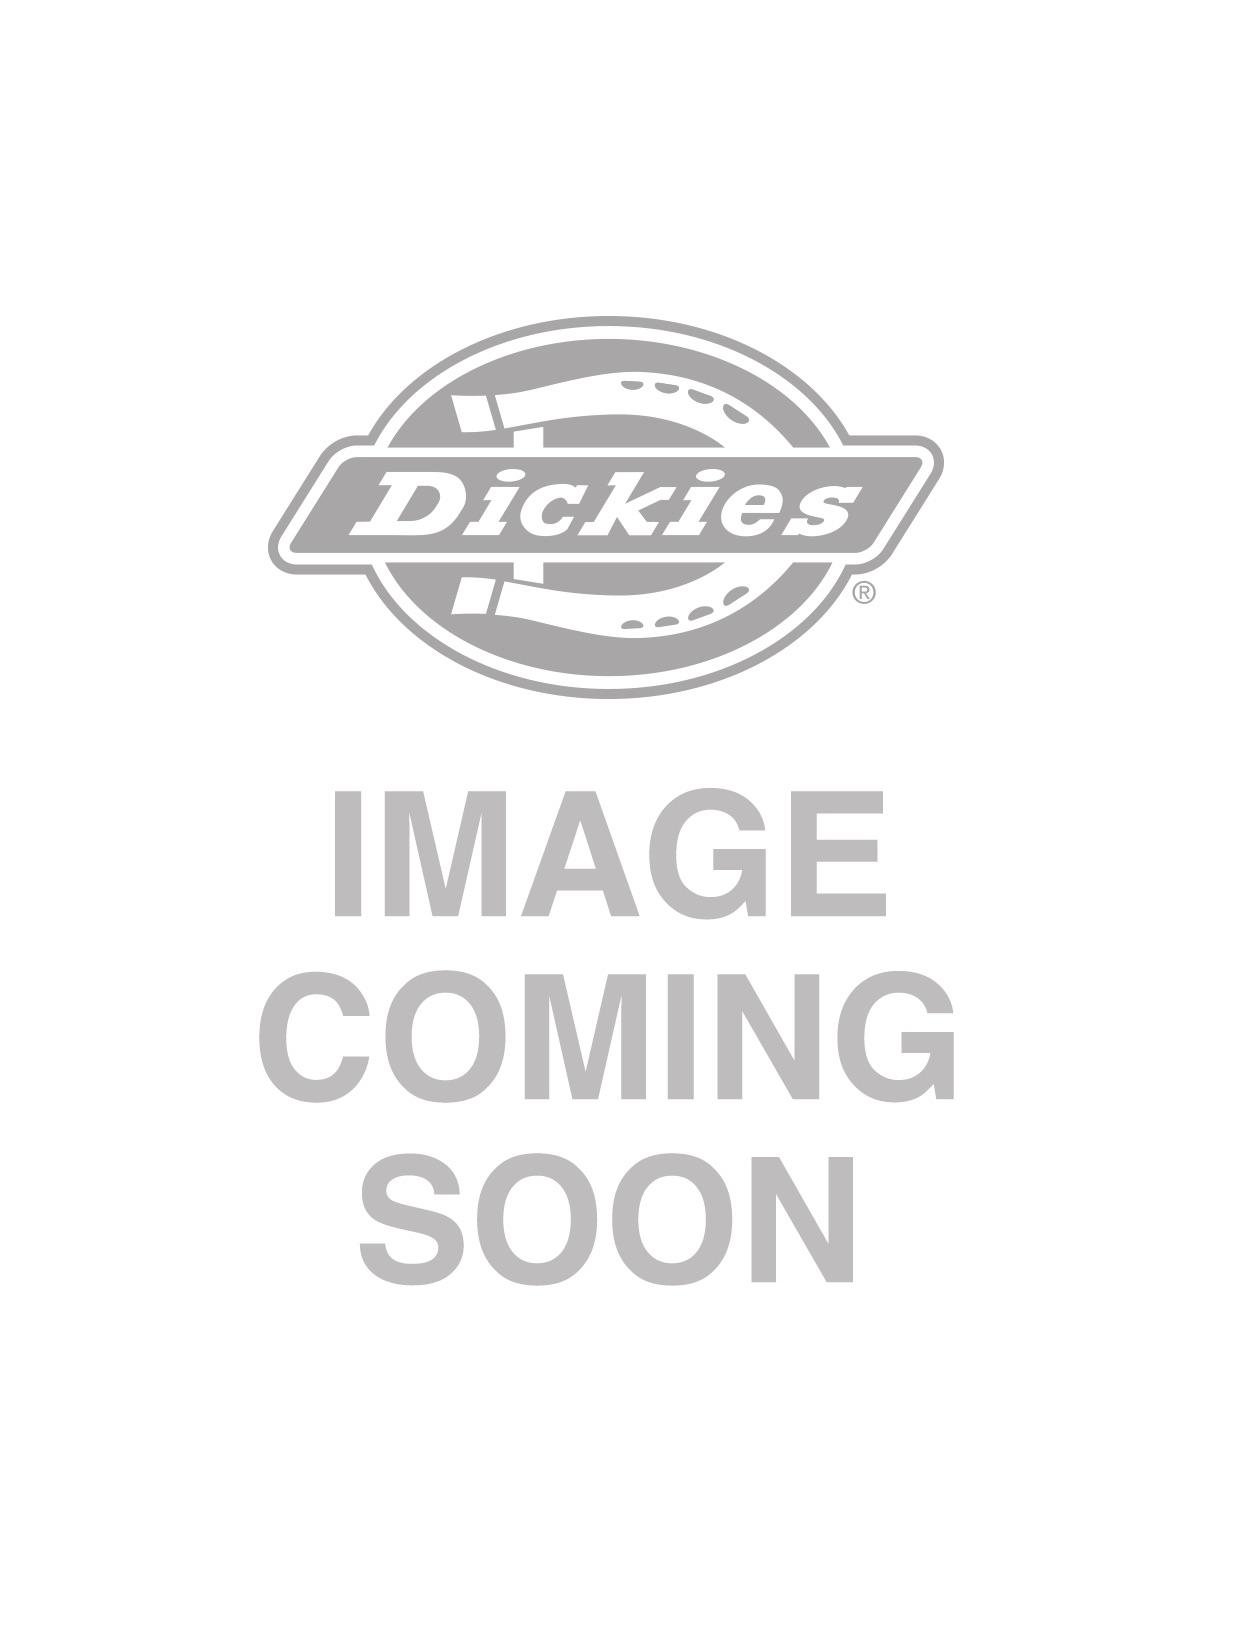 Dickies T-Shirt (3Pk)